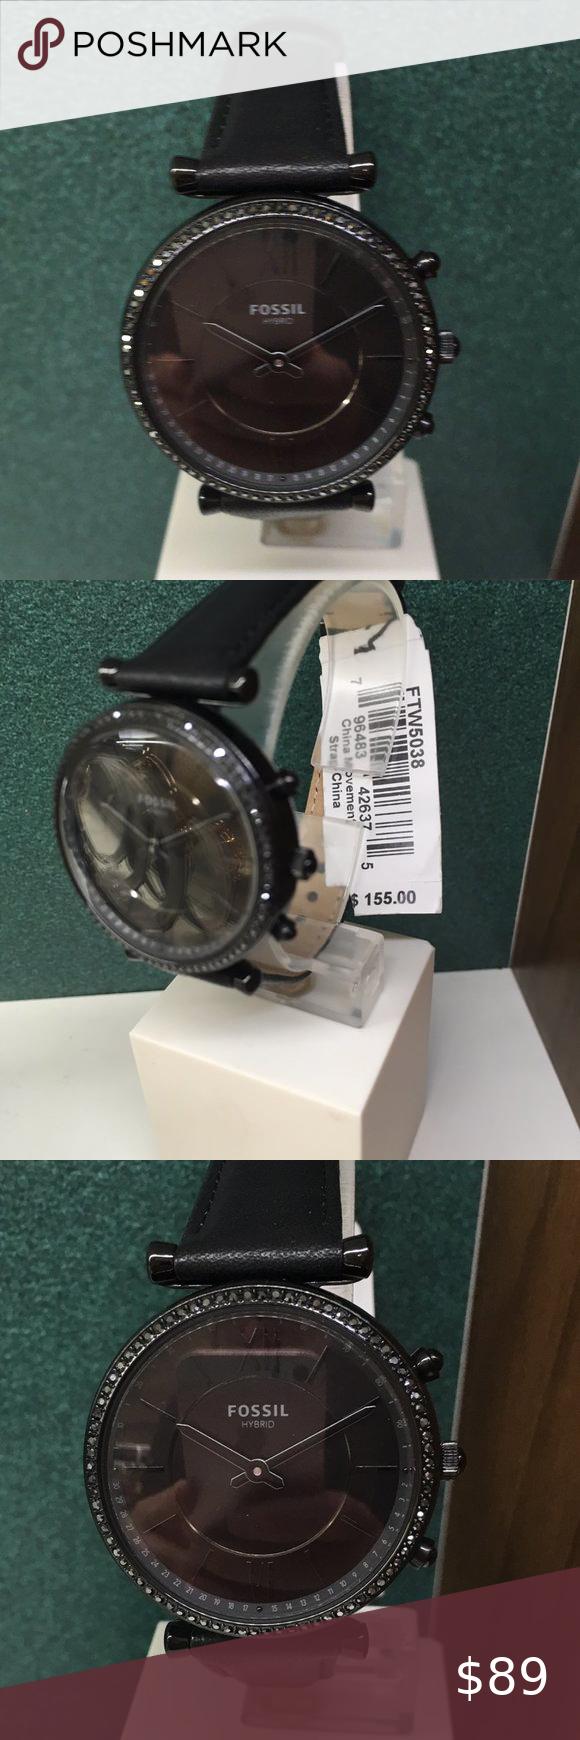 Fossil Ftw5038 Hybrid Smartwatch Carlie Black Notifications Alarm Clock App Alerts Calendar Alerts Smart Watch Activity Tracker Interchangeable Watch Bands